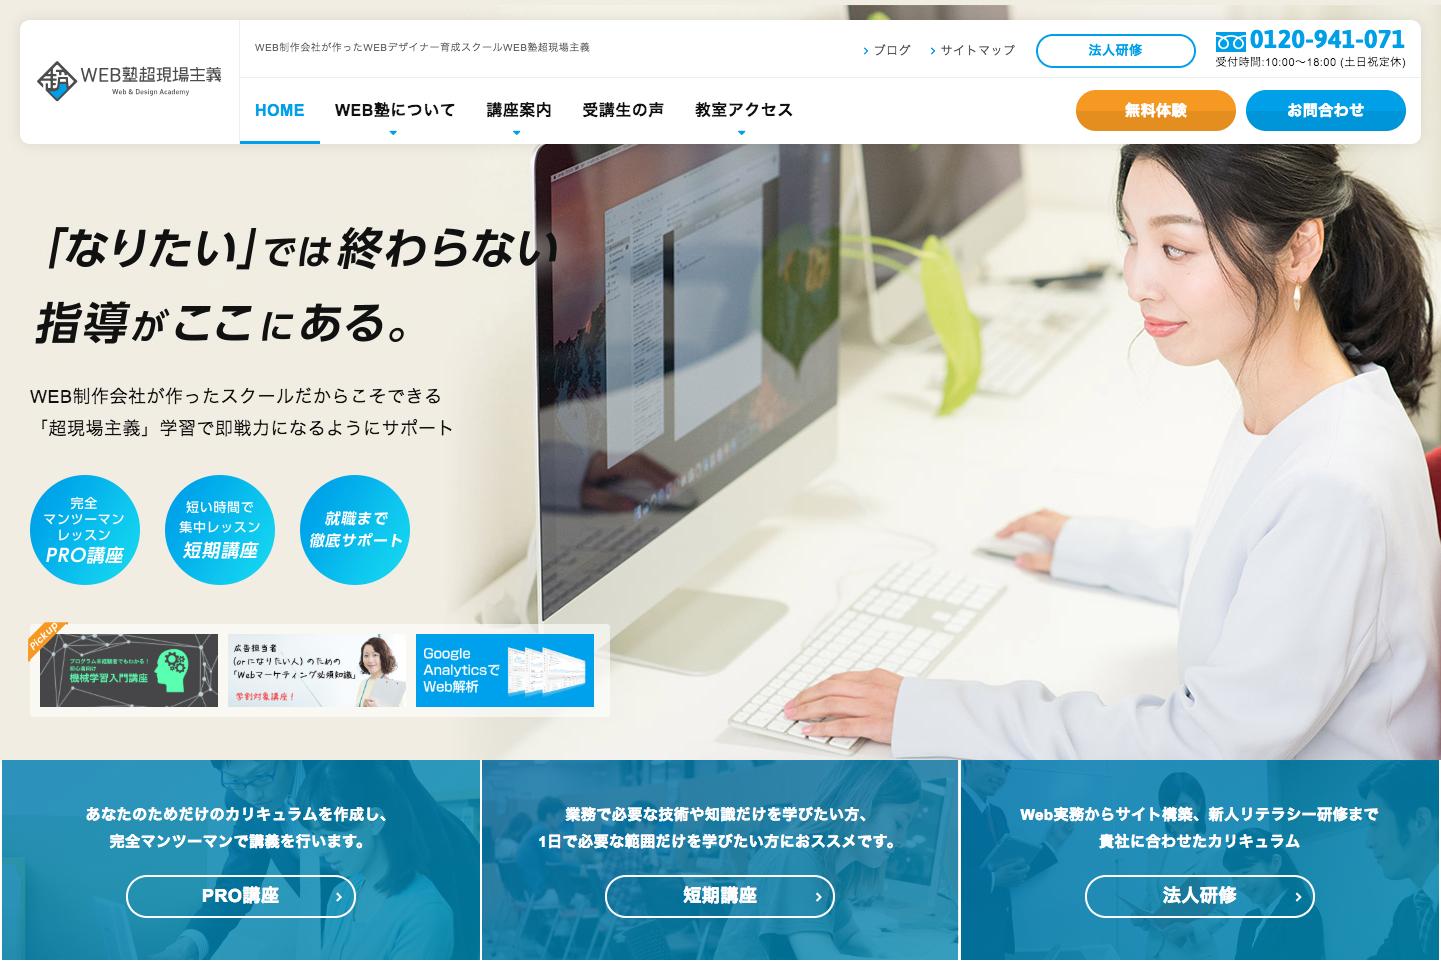 WEB制作会社が作ったWEBデザイナー育成スクールWEB塾超現場主義